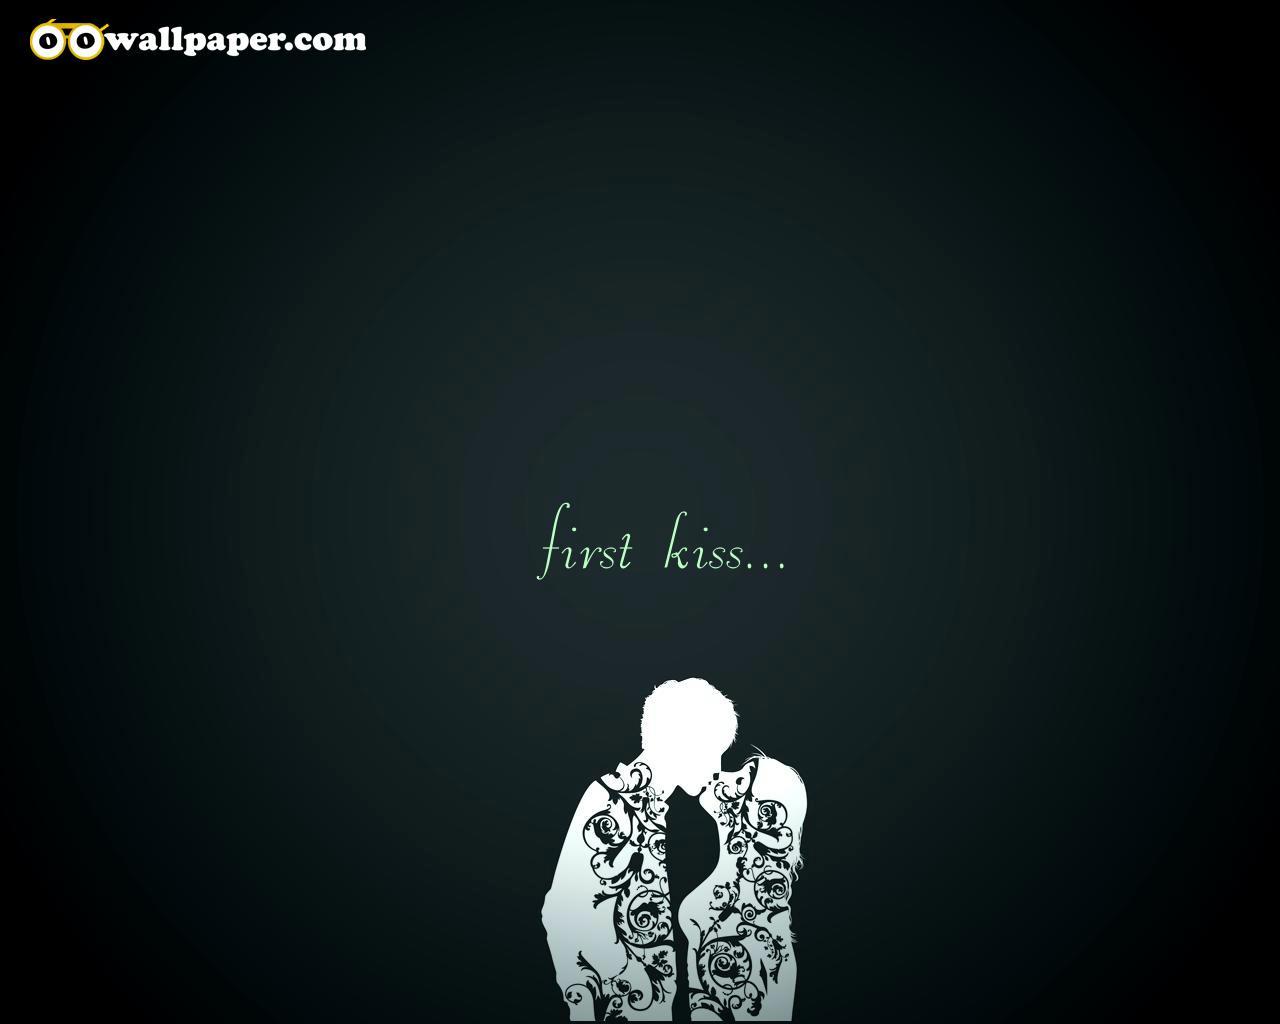 http://2.bp.blogspot.com/-vv0g4KiNBqc/TwgzU-vG5eI/AAAAAAAAAms/J-FnsThOA8E/s1600/oo_Love+25.jpg